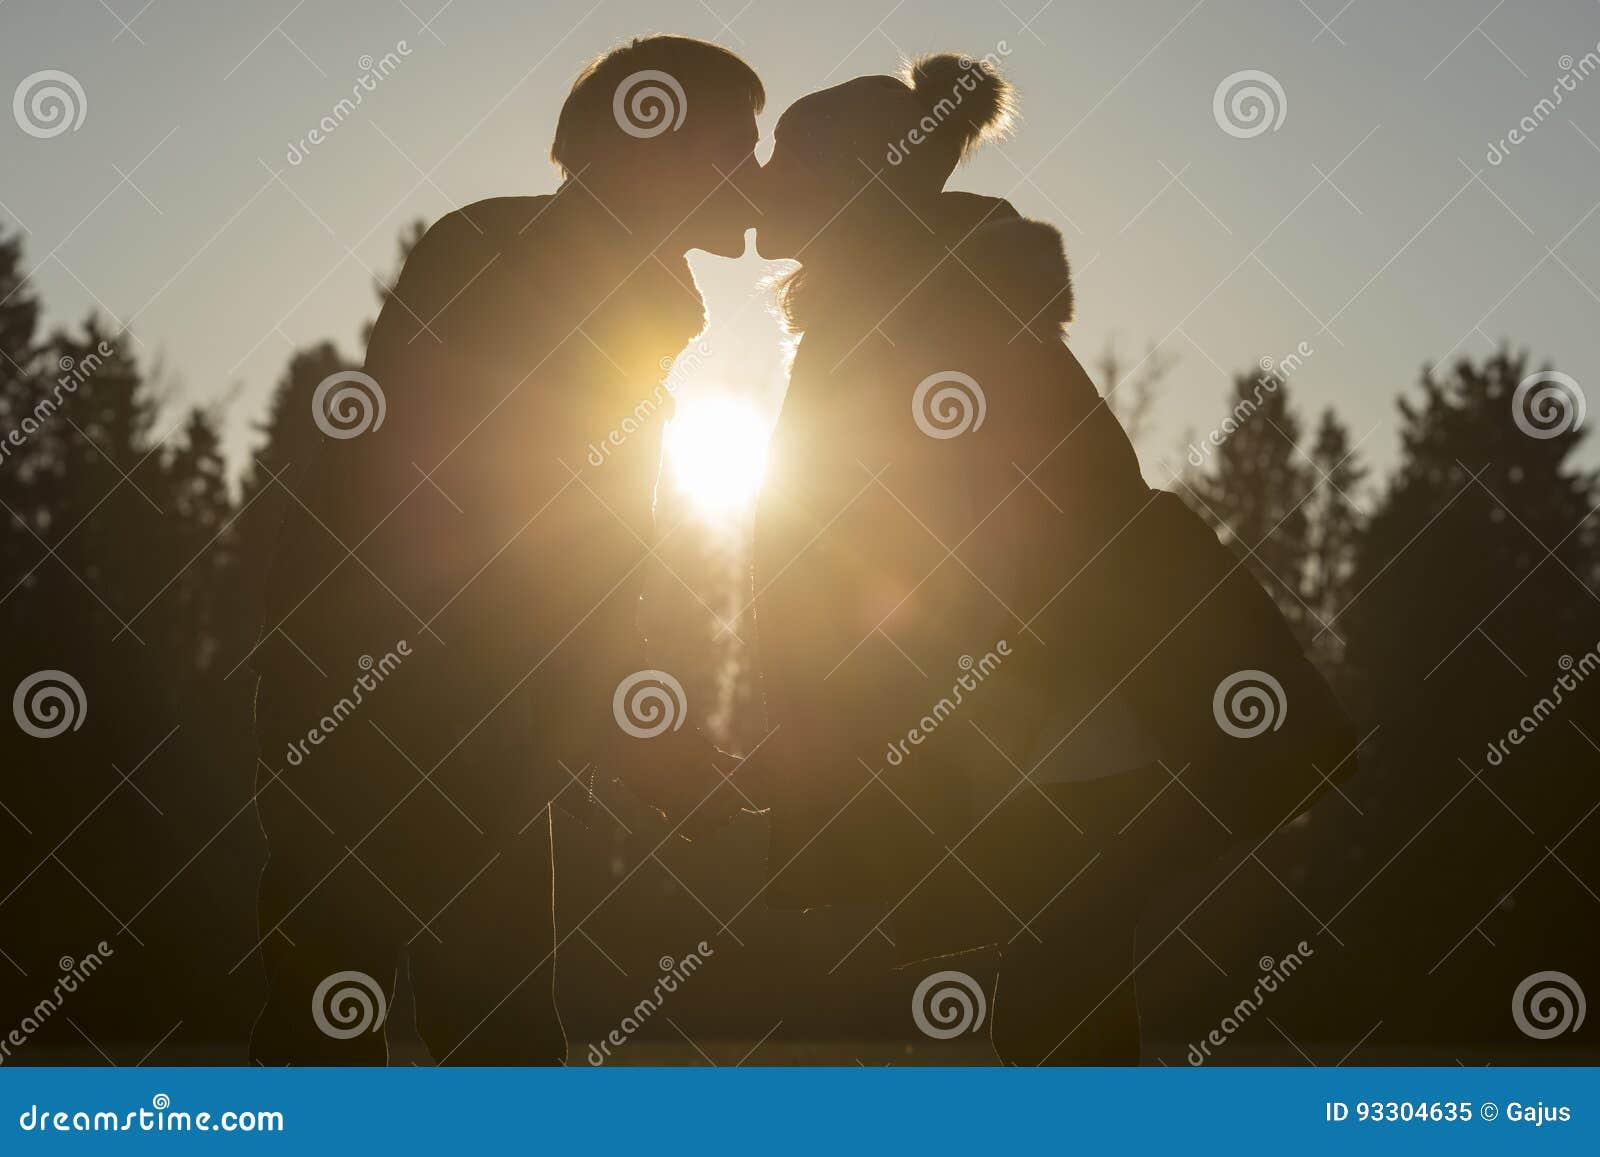 Vrouwen kussende partner in openlucht